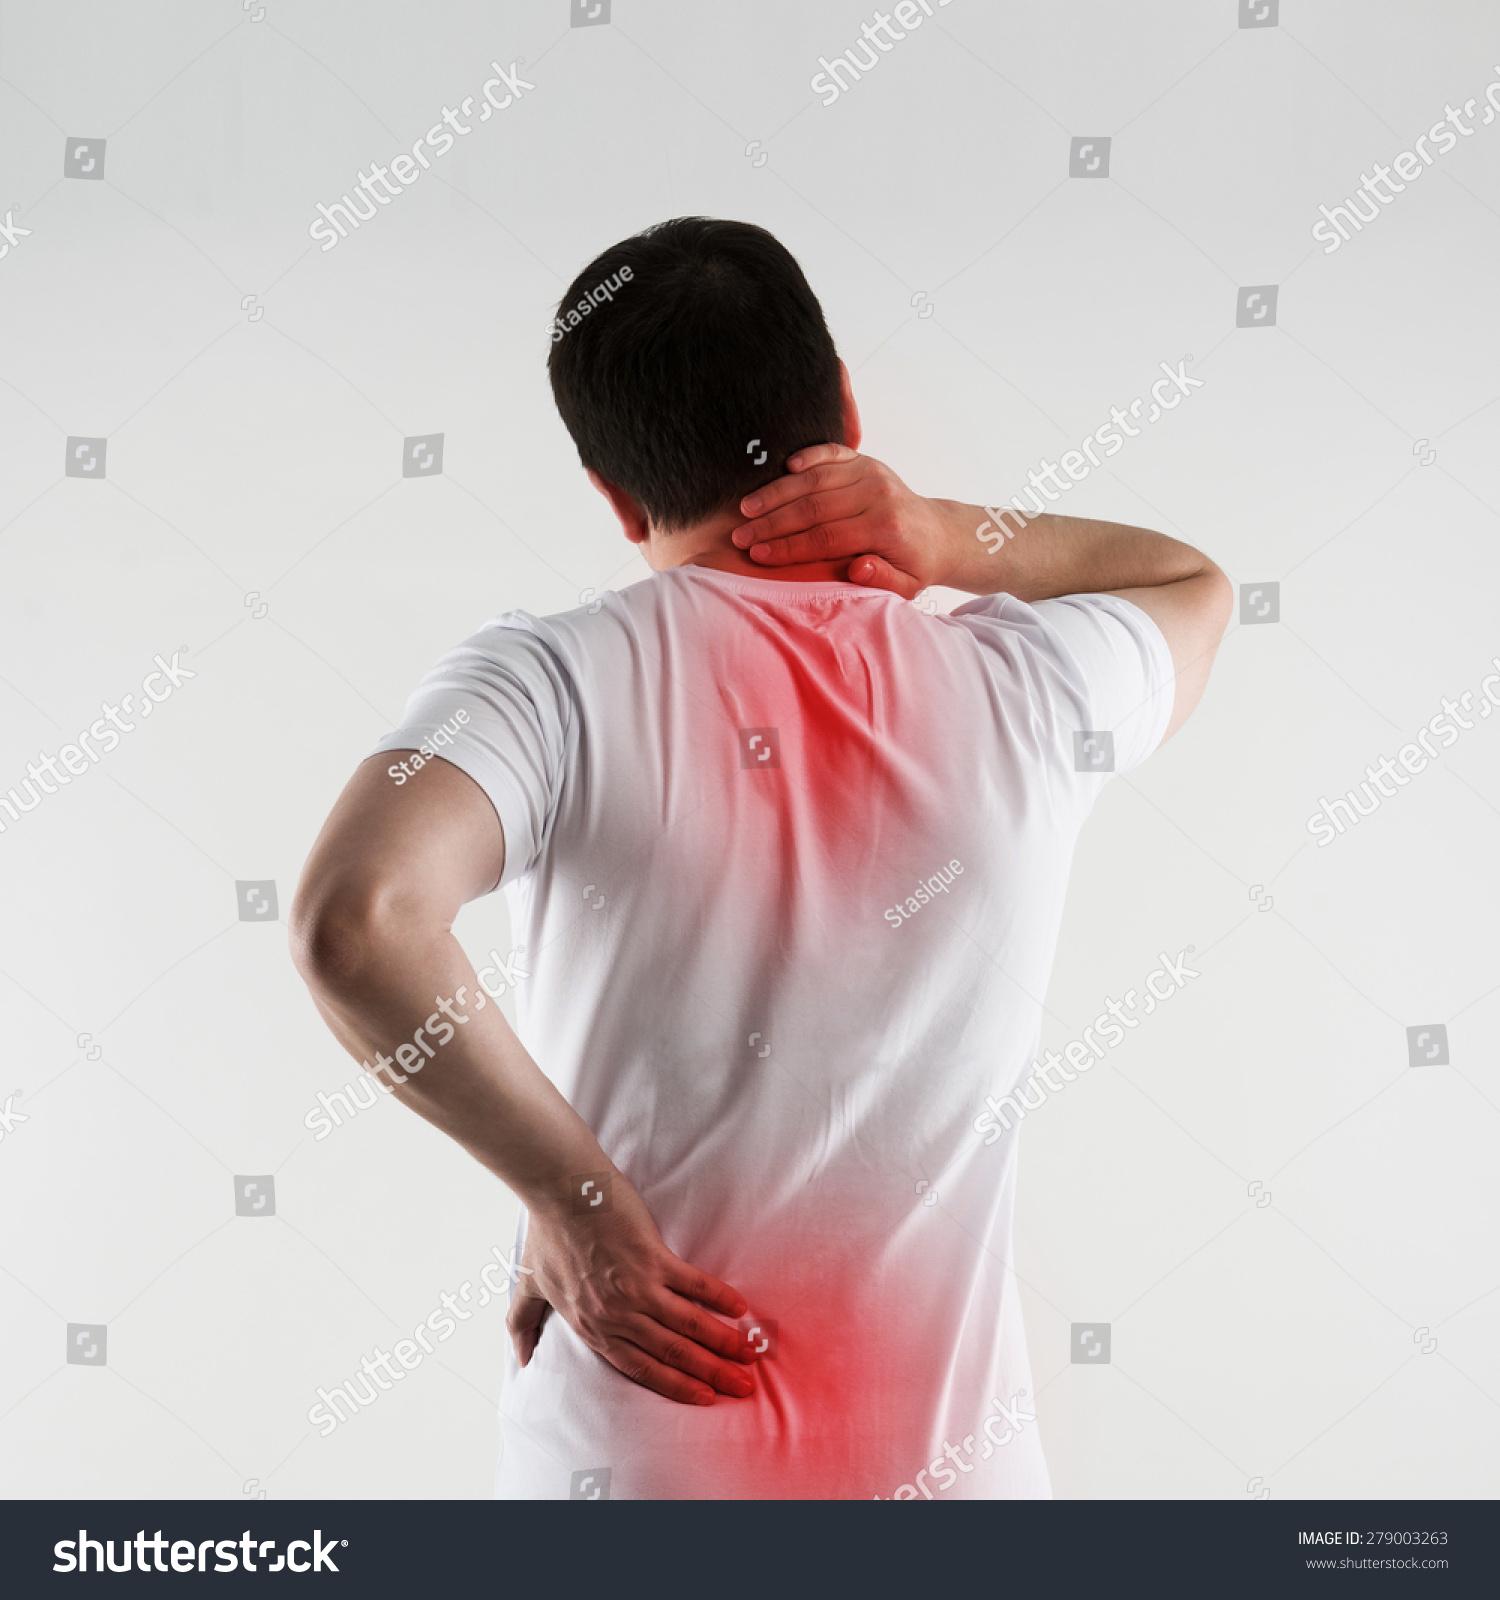 Scoliosis On Young Man Back Backbone Imagen De Archivo (stock ...